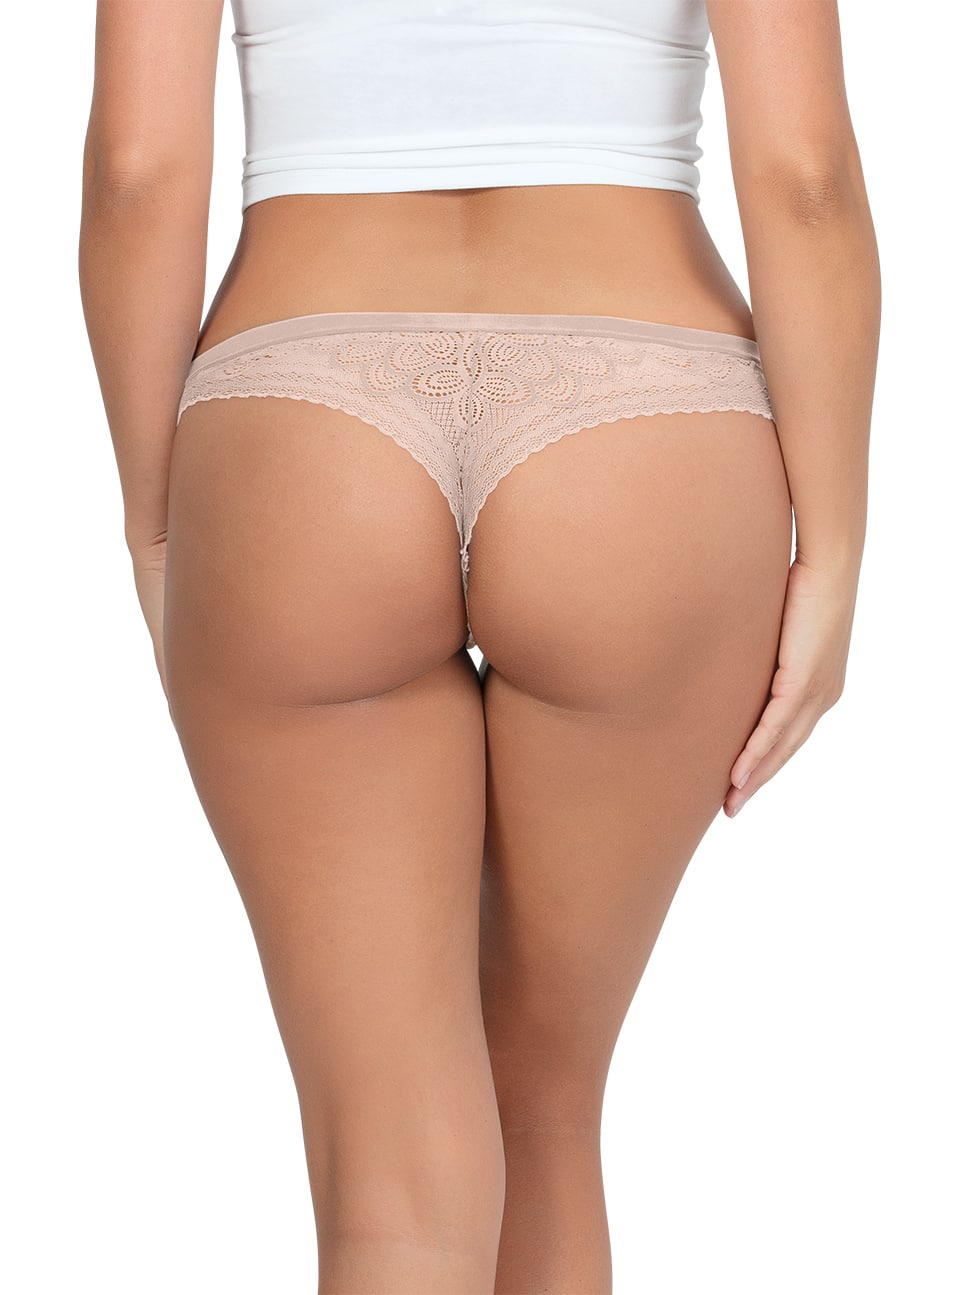 PARFAIT ParfaitPanty SoGlam ThongPP402 Bare Back - Panty So Glam Thong - Bare - PP402